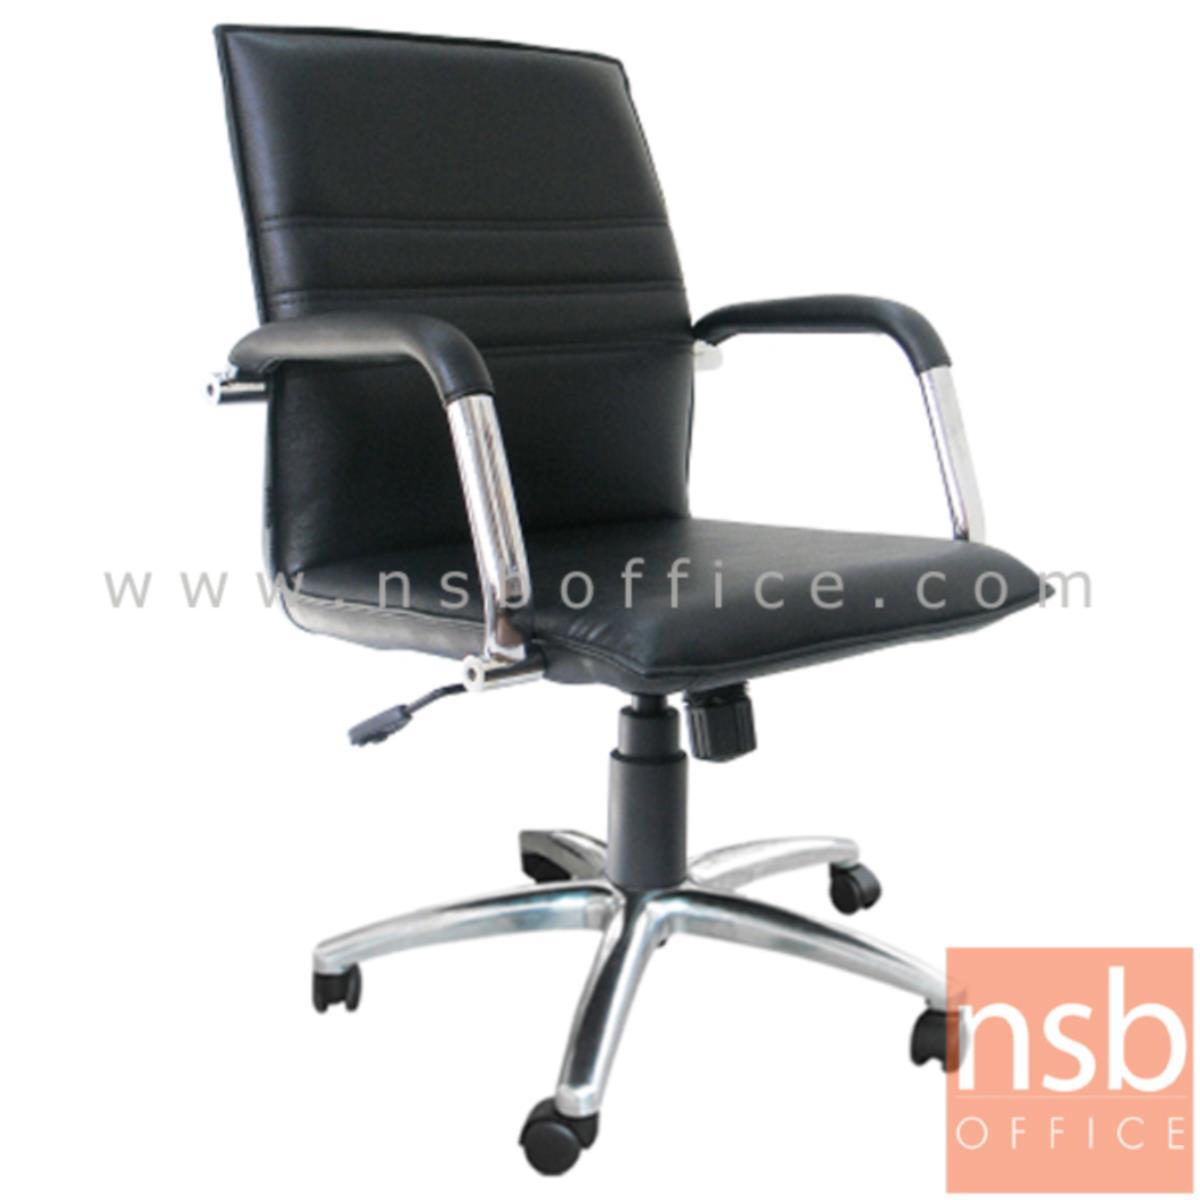 B03A258:เก้าอี้สำนักงาน รุ่น Stanton (สแตนตัน)  โช๊คแก๊ส มีก้อนโยก ขาเหล็กชุบโครเมี่ยม